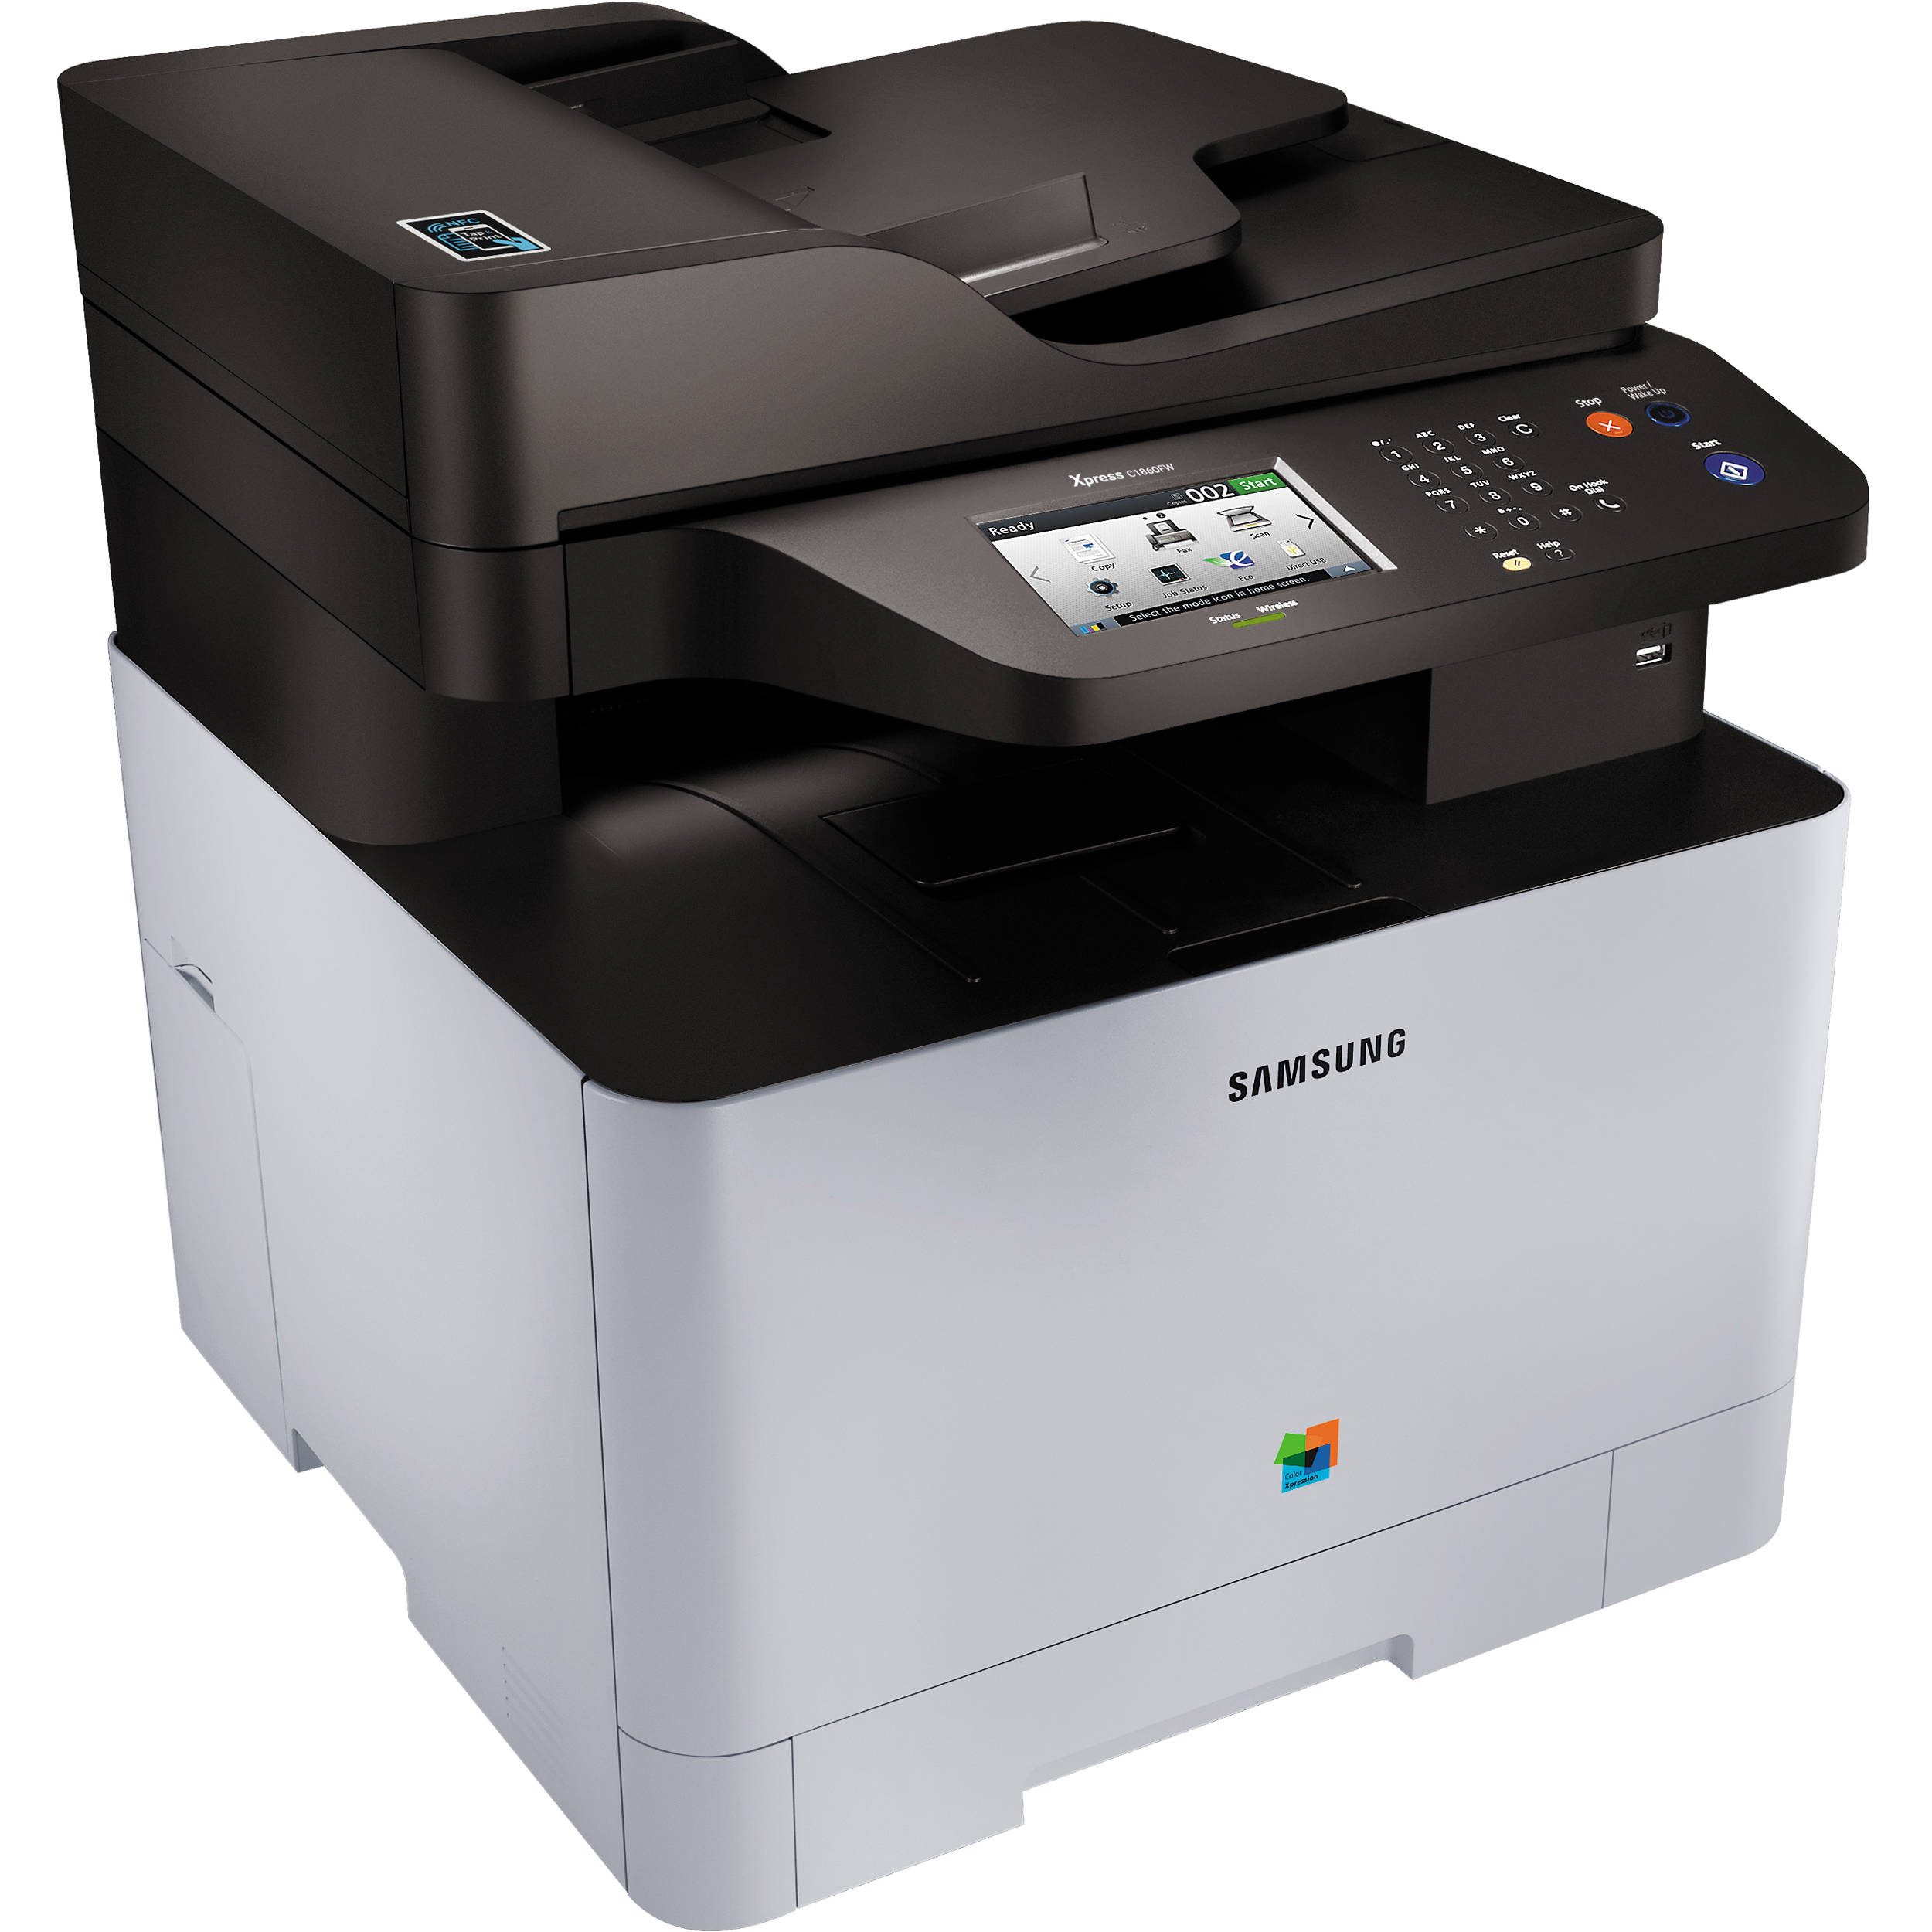 Color wireless printer laser - Samsung Xpress C1860fw Color All In One Laser Printer